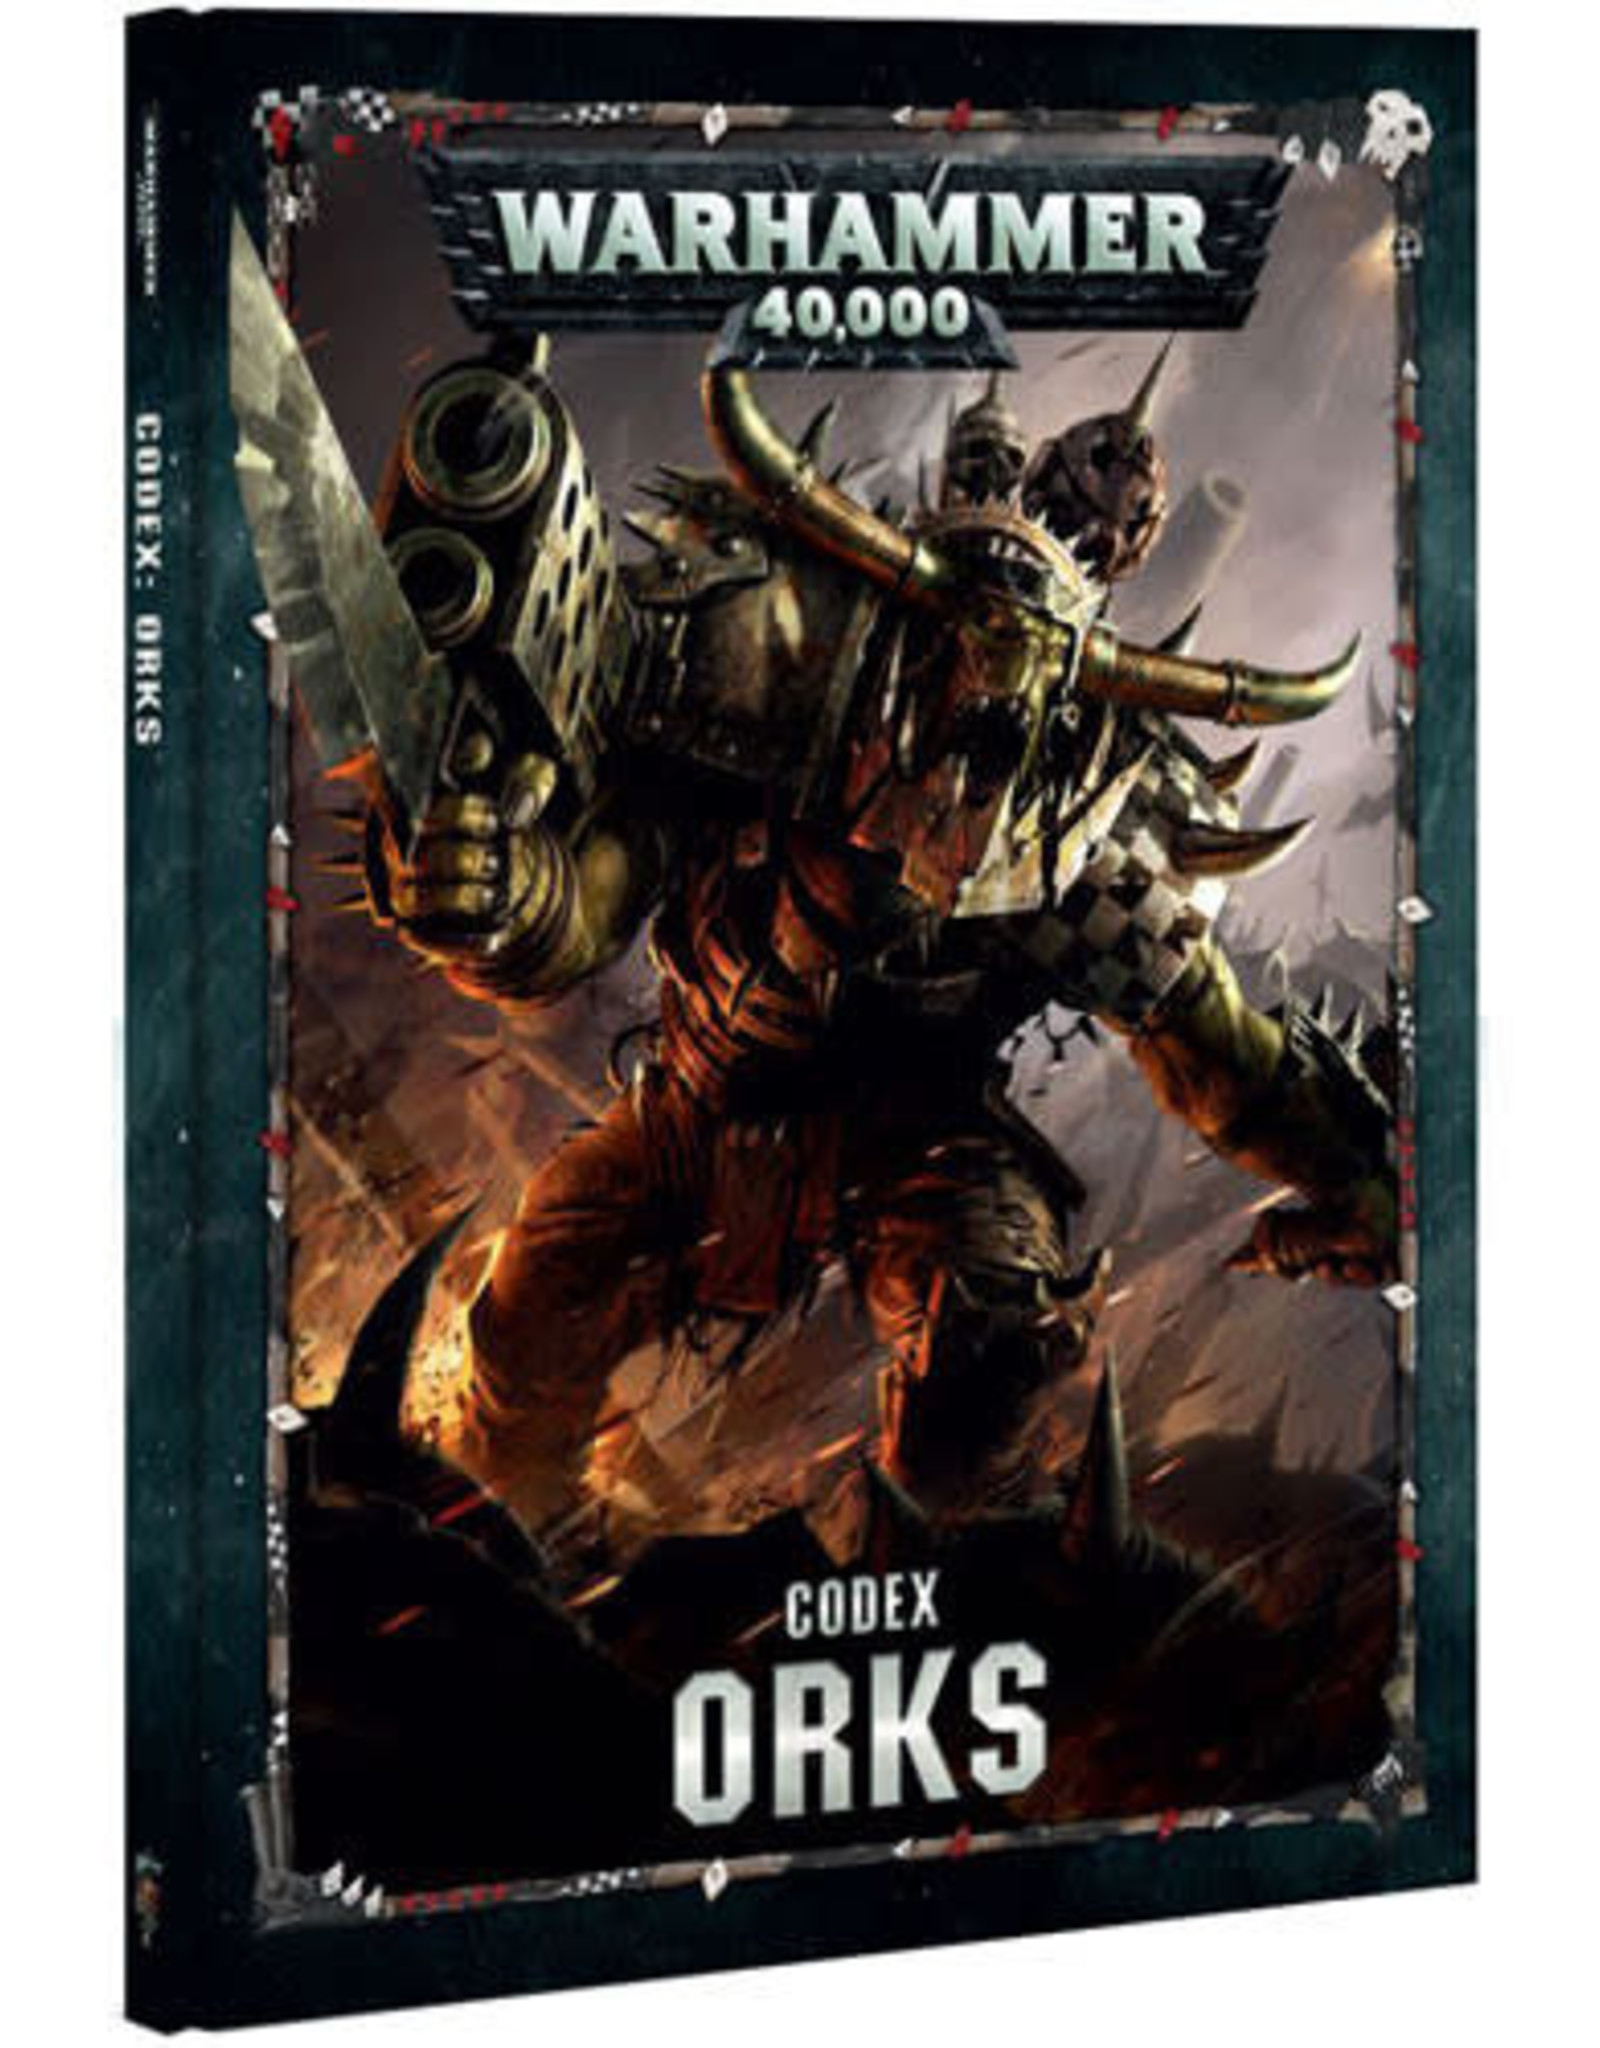 Games Workshop Warhammer 40K Codex Orks (8th Edition)